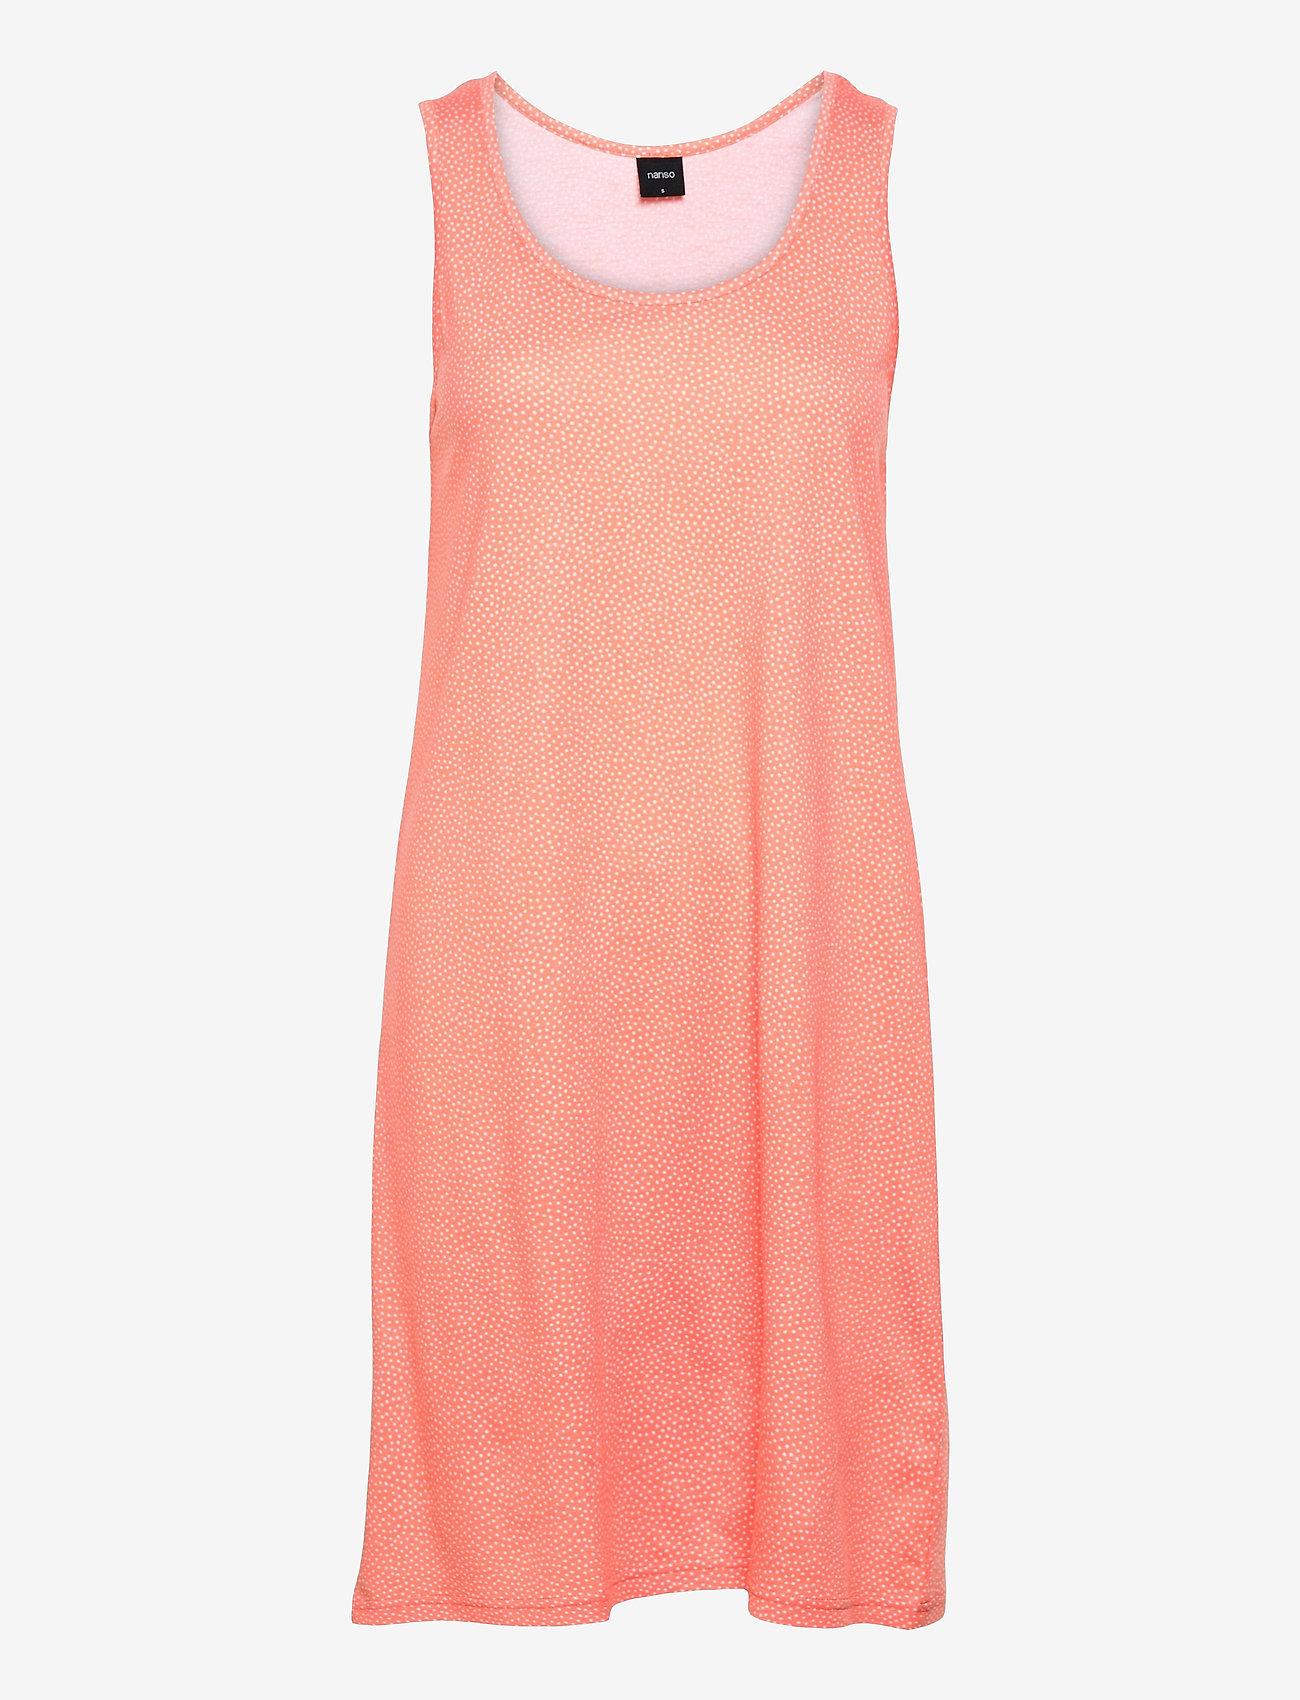 Nanso - Ladies big shirt, Pilkut - nightdresses - red - 0